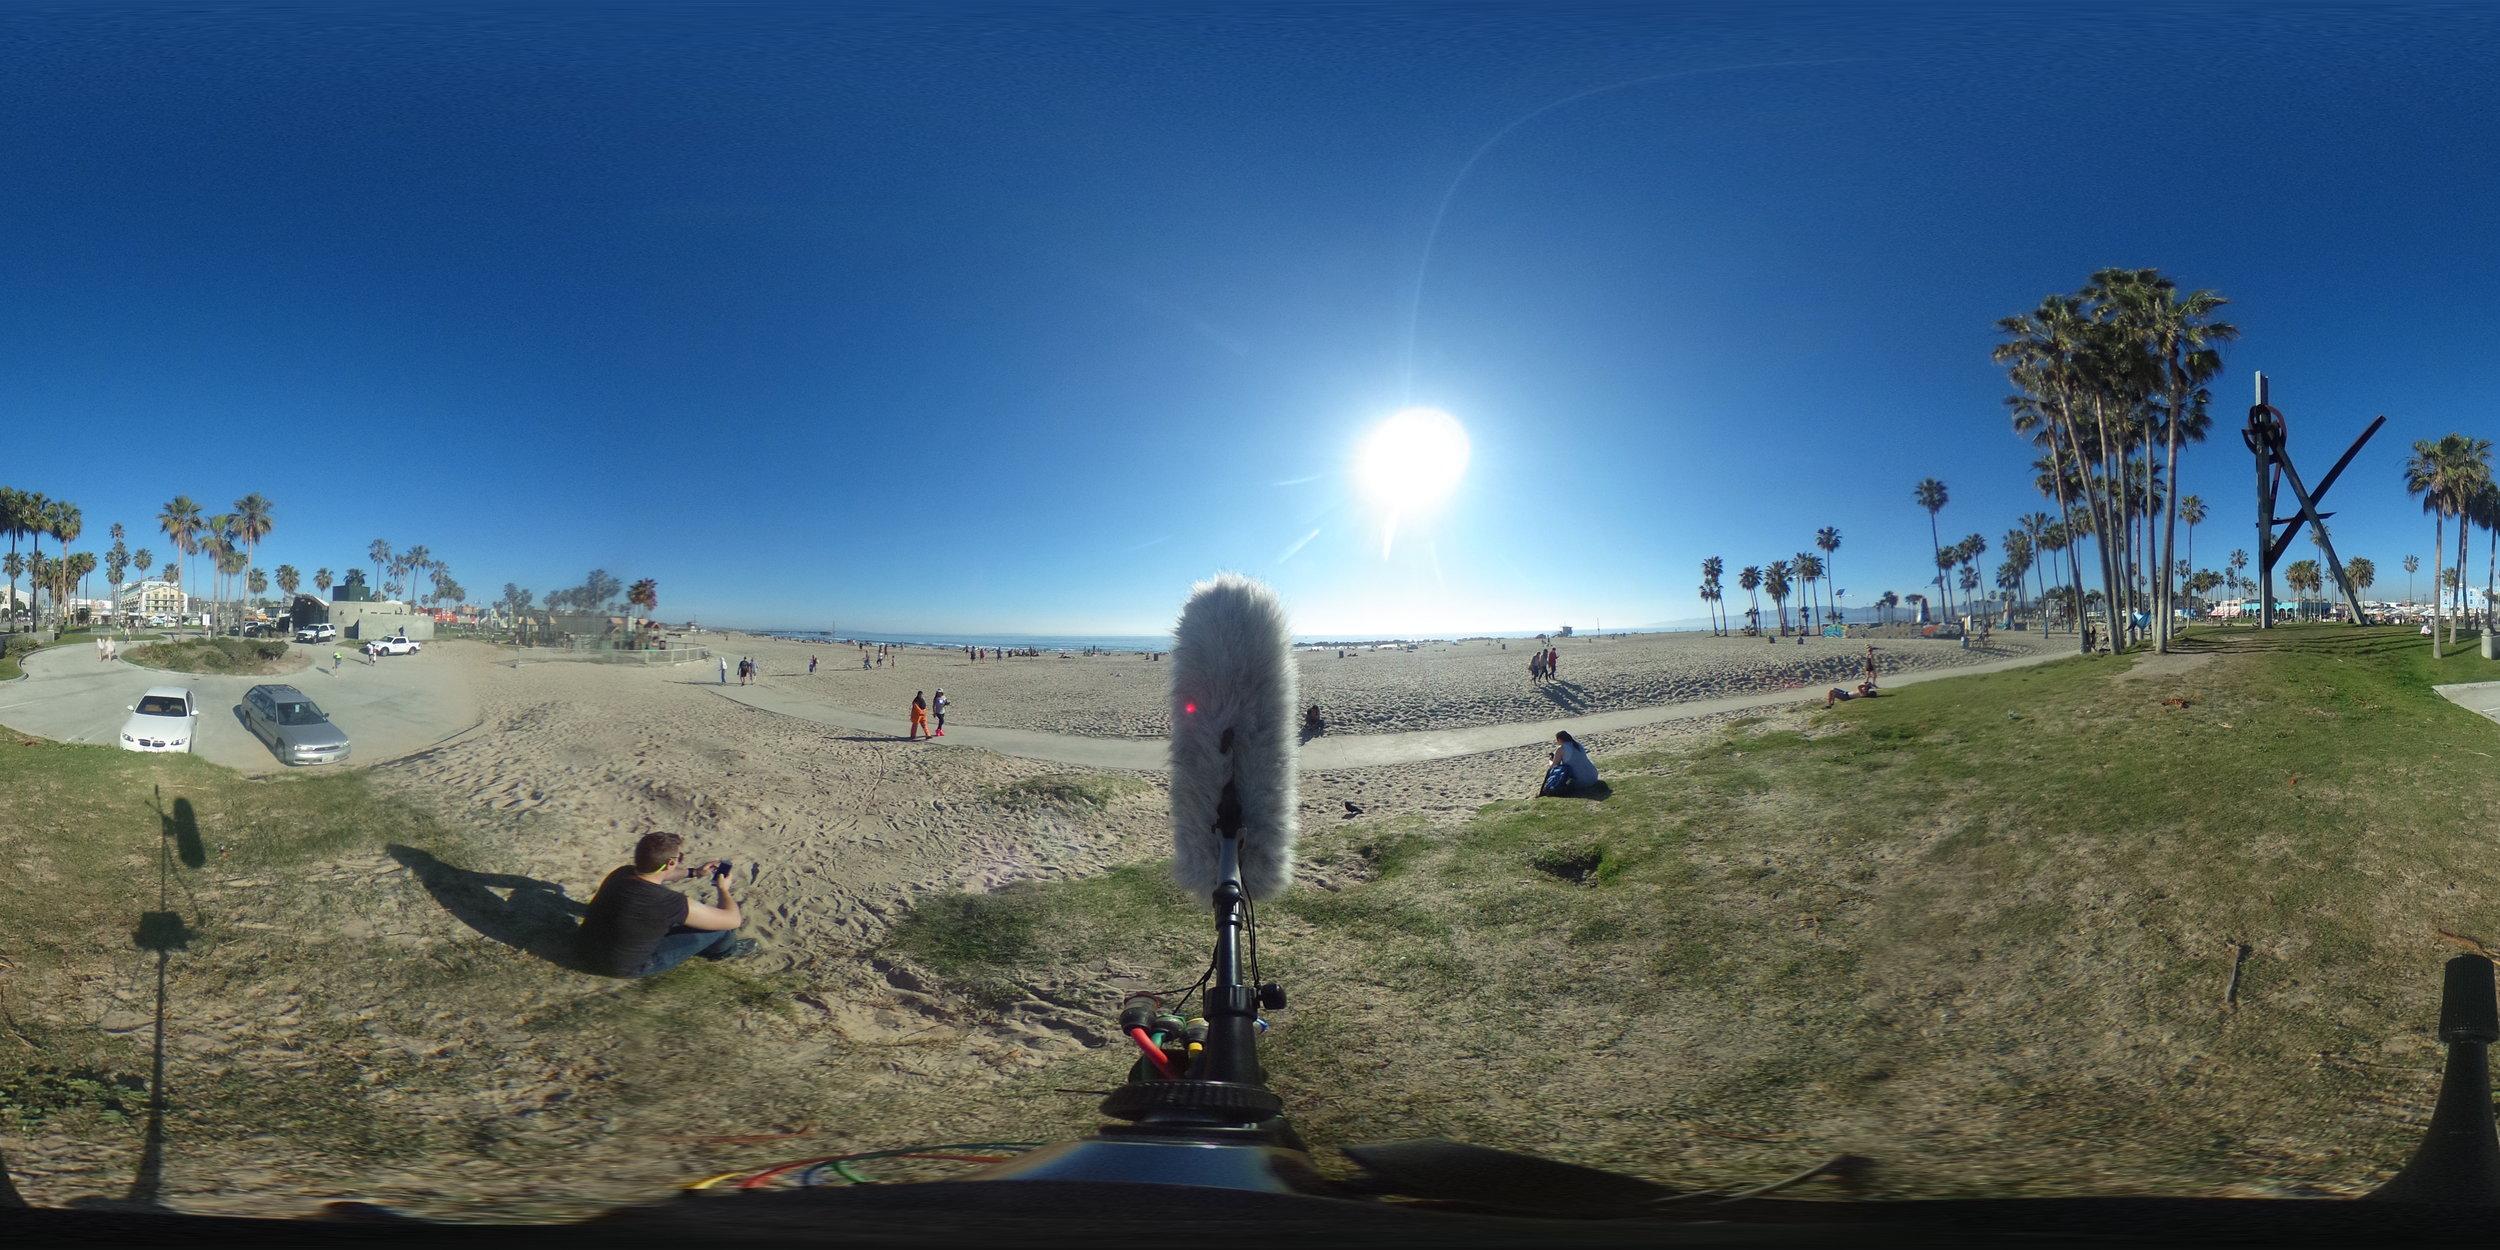 EXT_Day_Beach_Boardwalk_BikePath_ConstantSeaGulls_BicycleBys_PedestrianSlowBys_MediumToDistantPerformanceCrowd_DistantMusicSporadically_JPEG.JPG